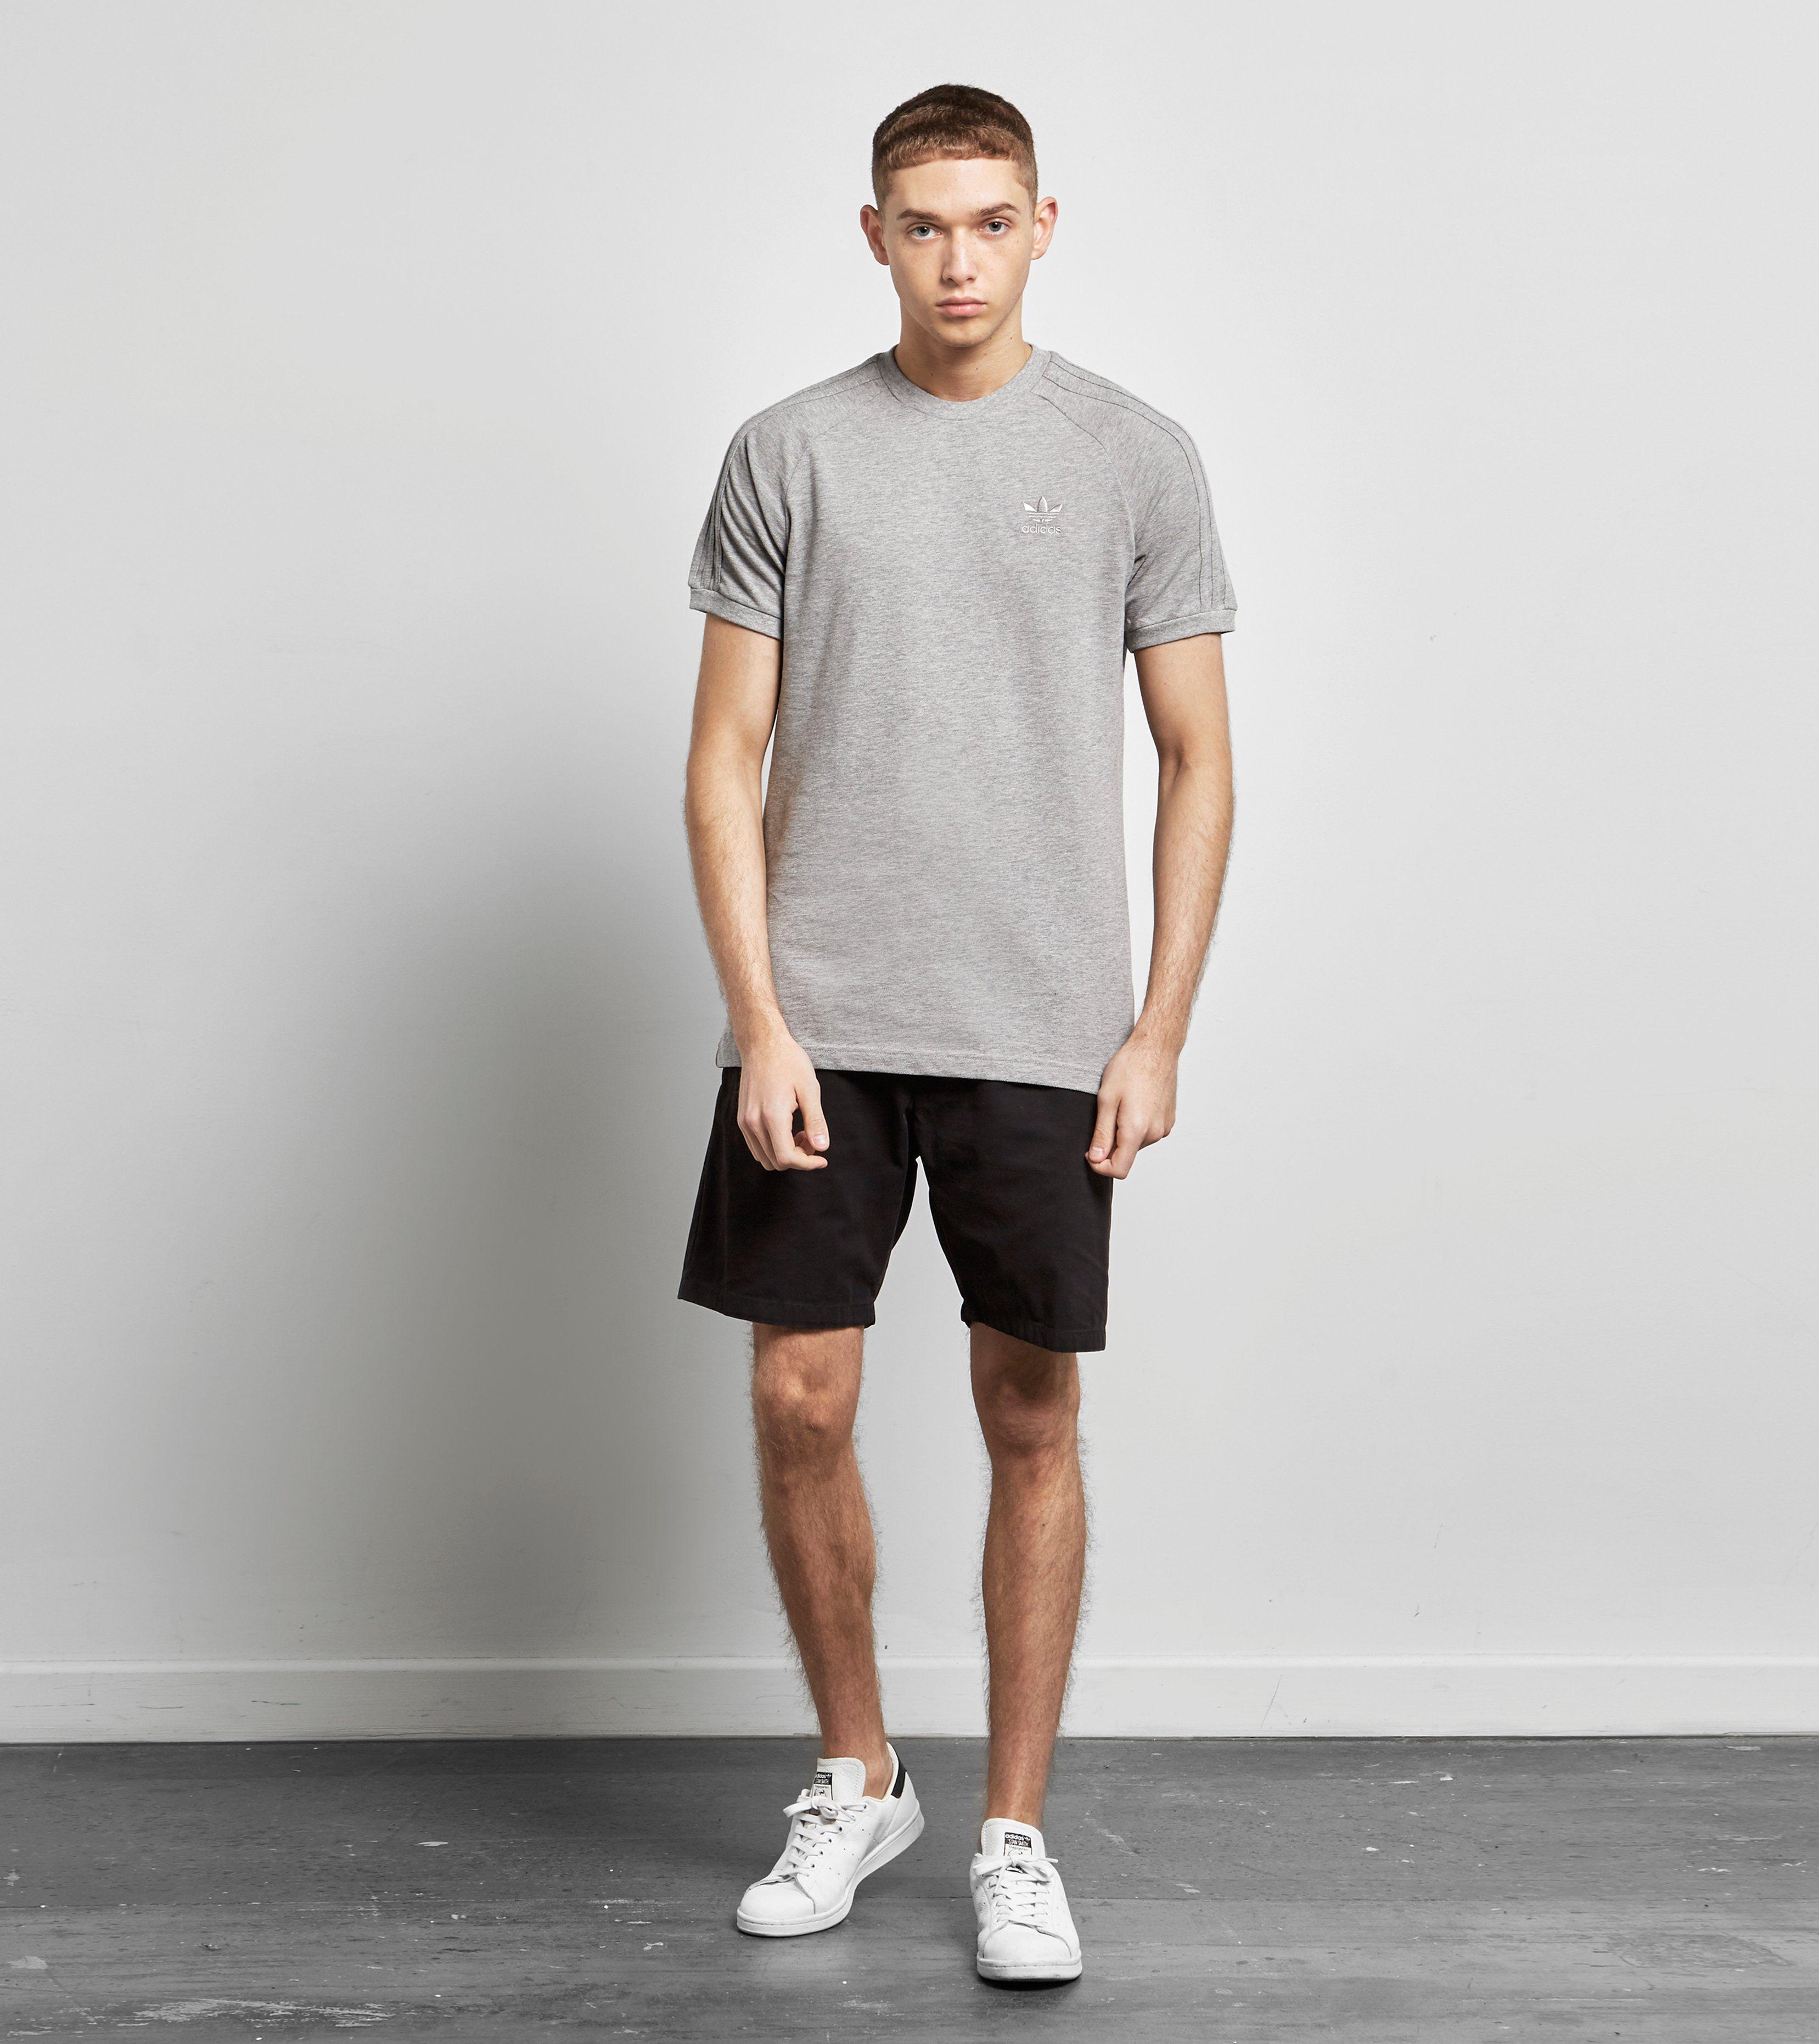 adidas Originals Crew Pique T-Shirt